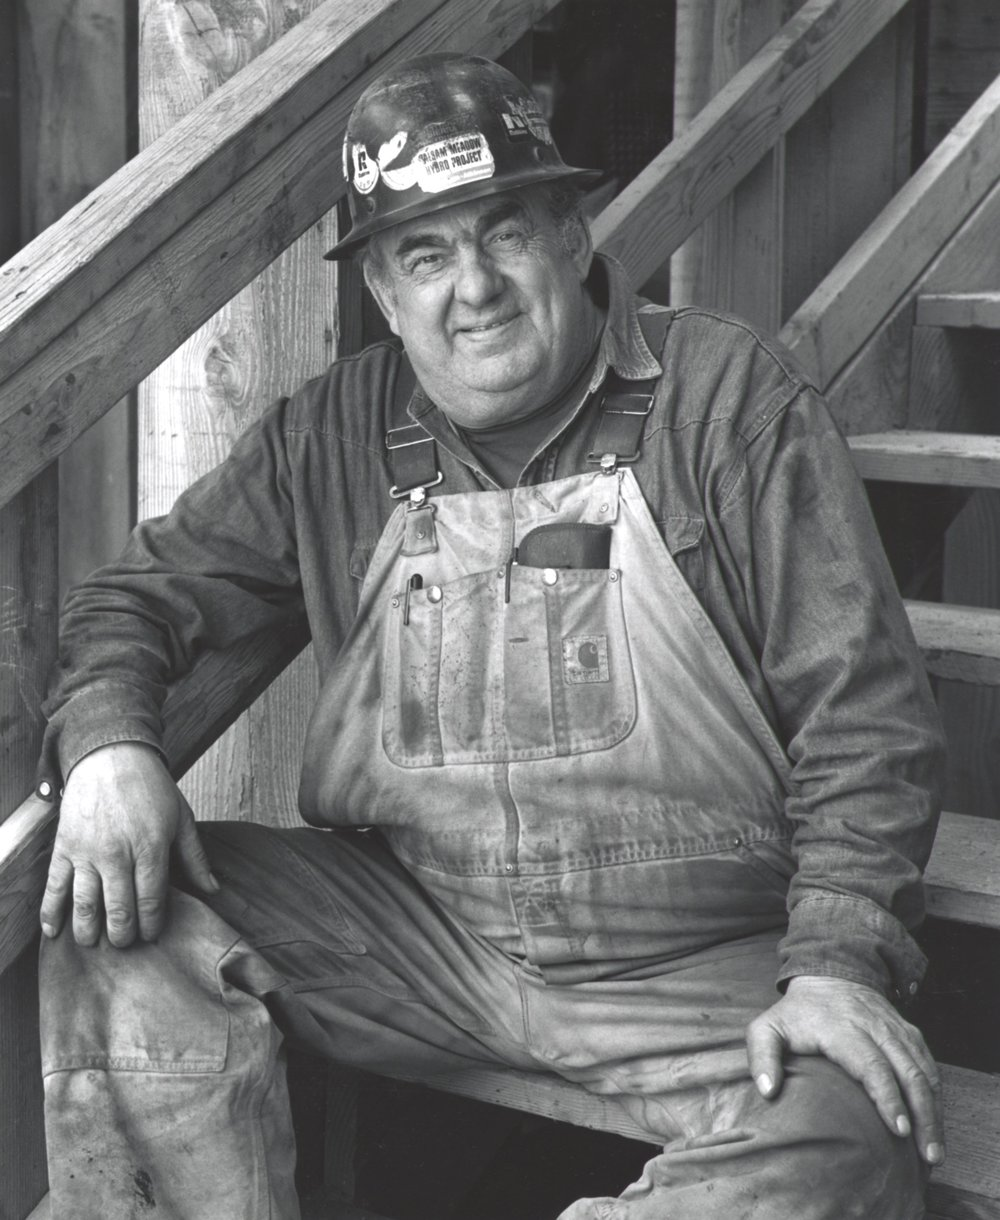 Jack Smiley 1995